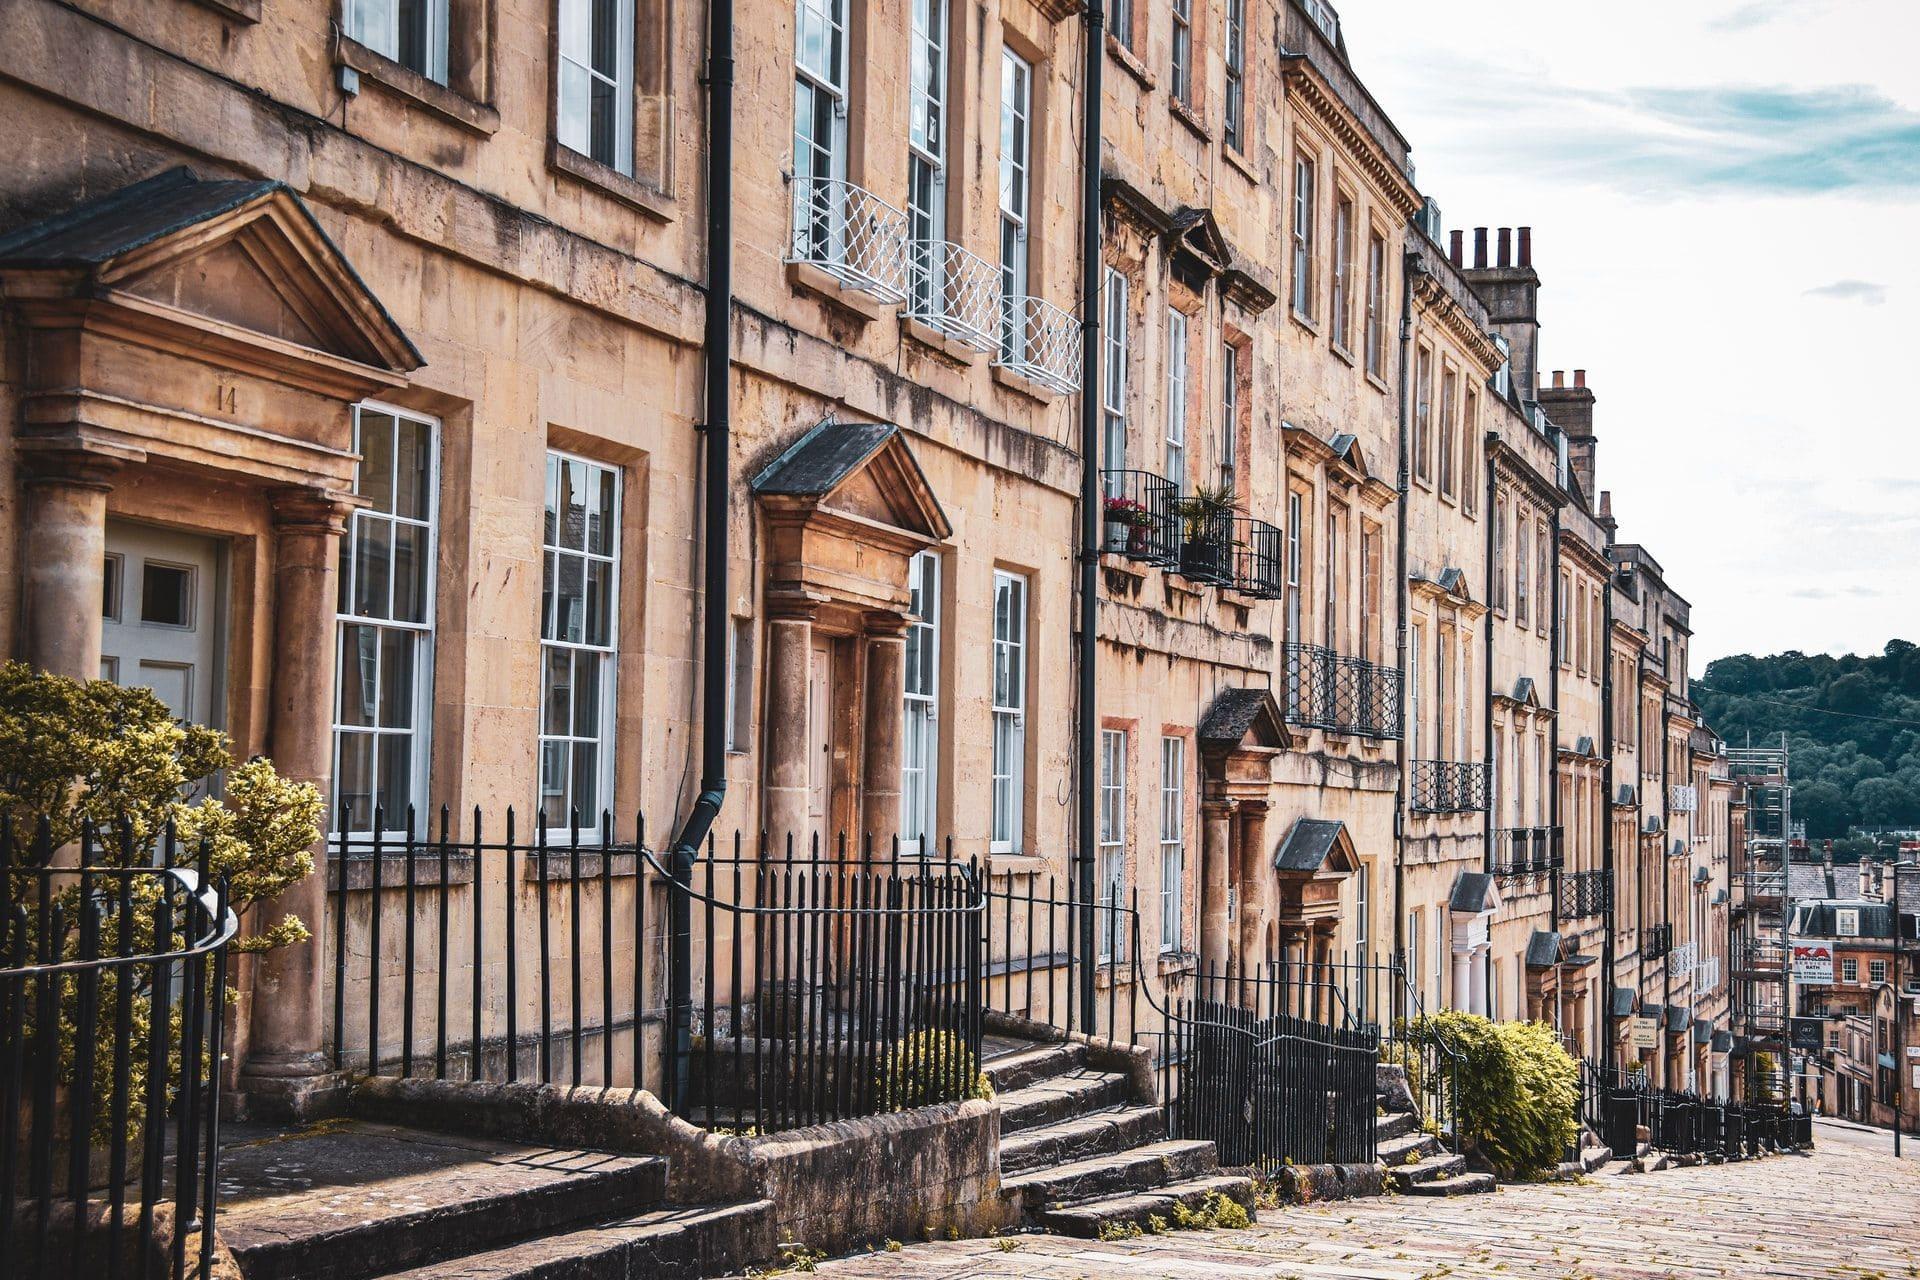 street-of-pretty-terraced-houses-in-bath-england-romantic-weekend-breaks-uk